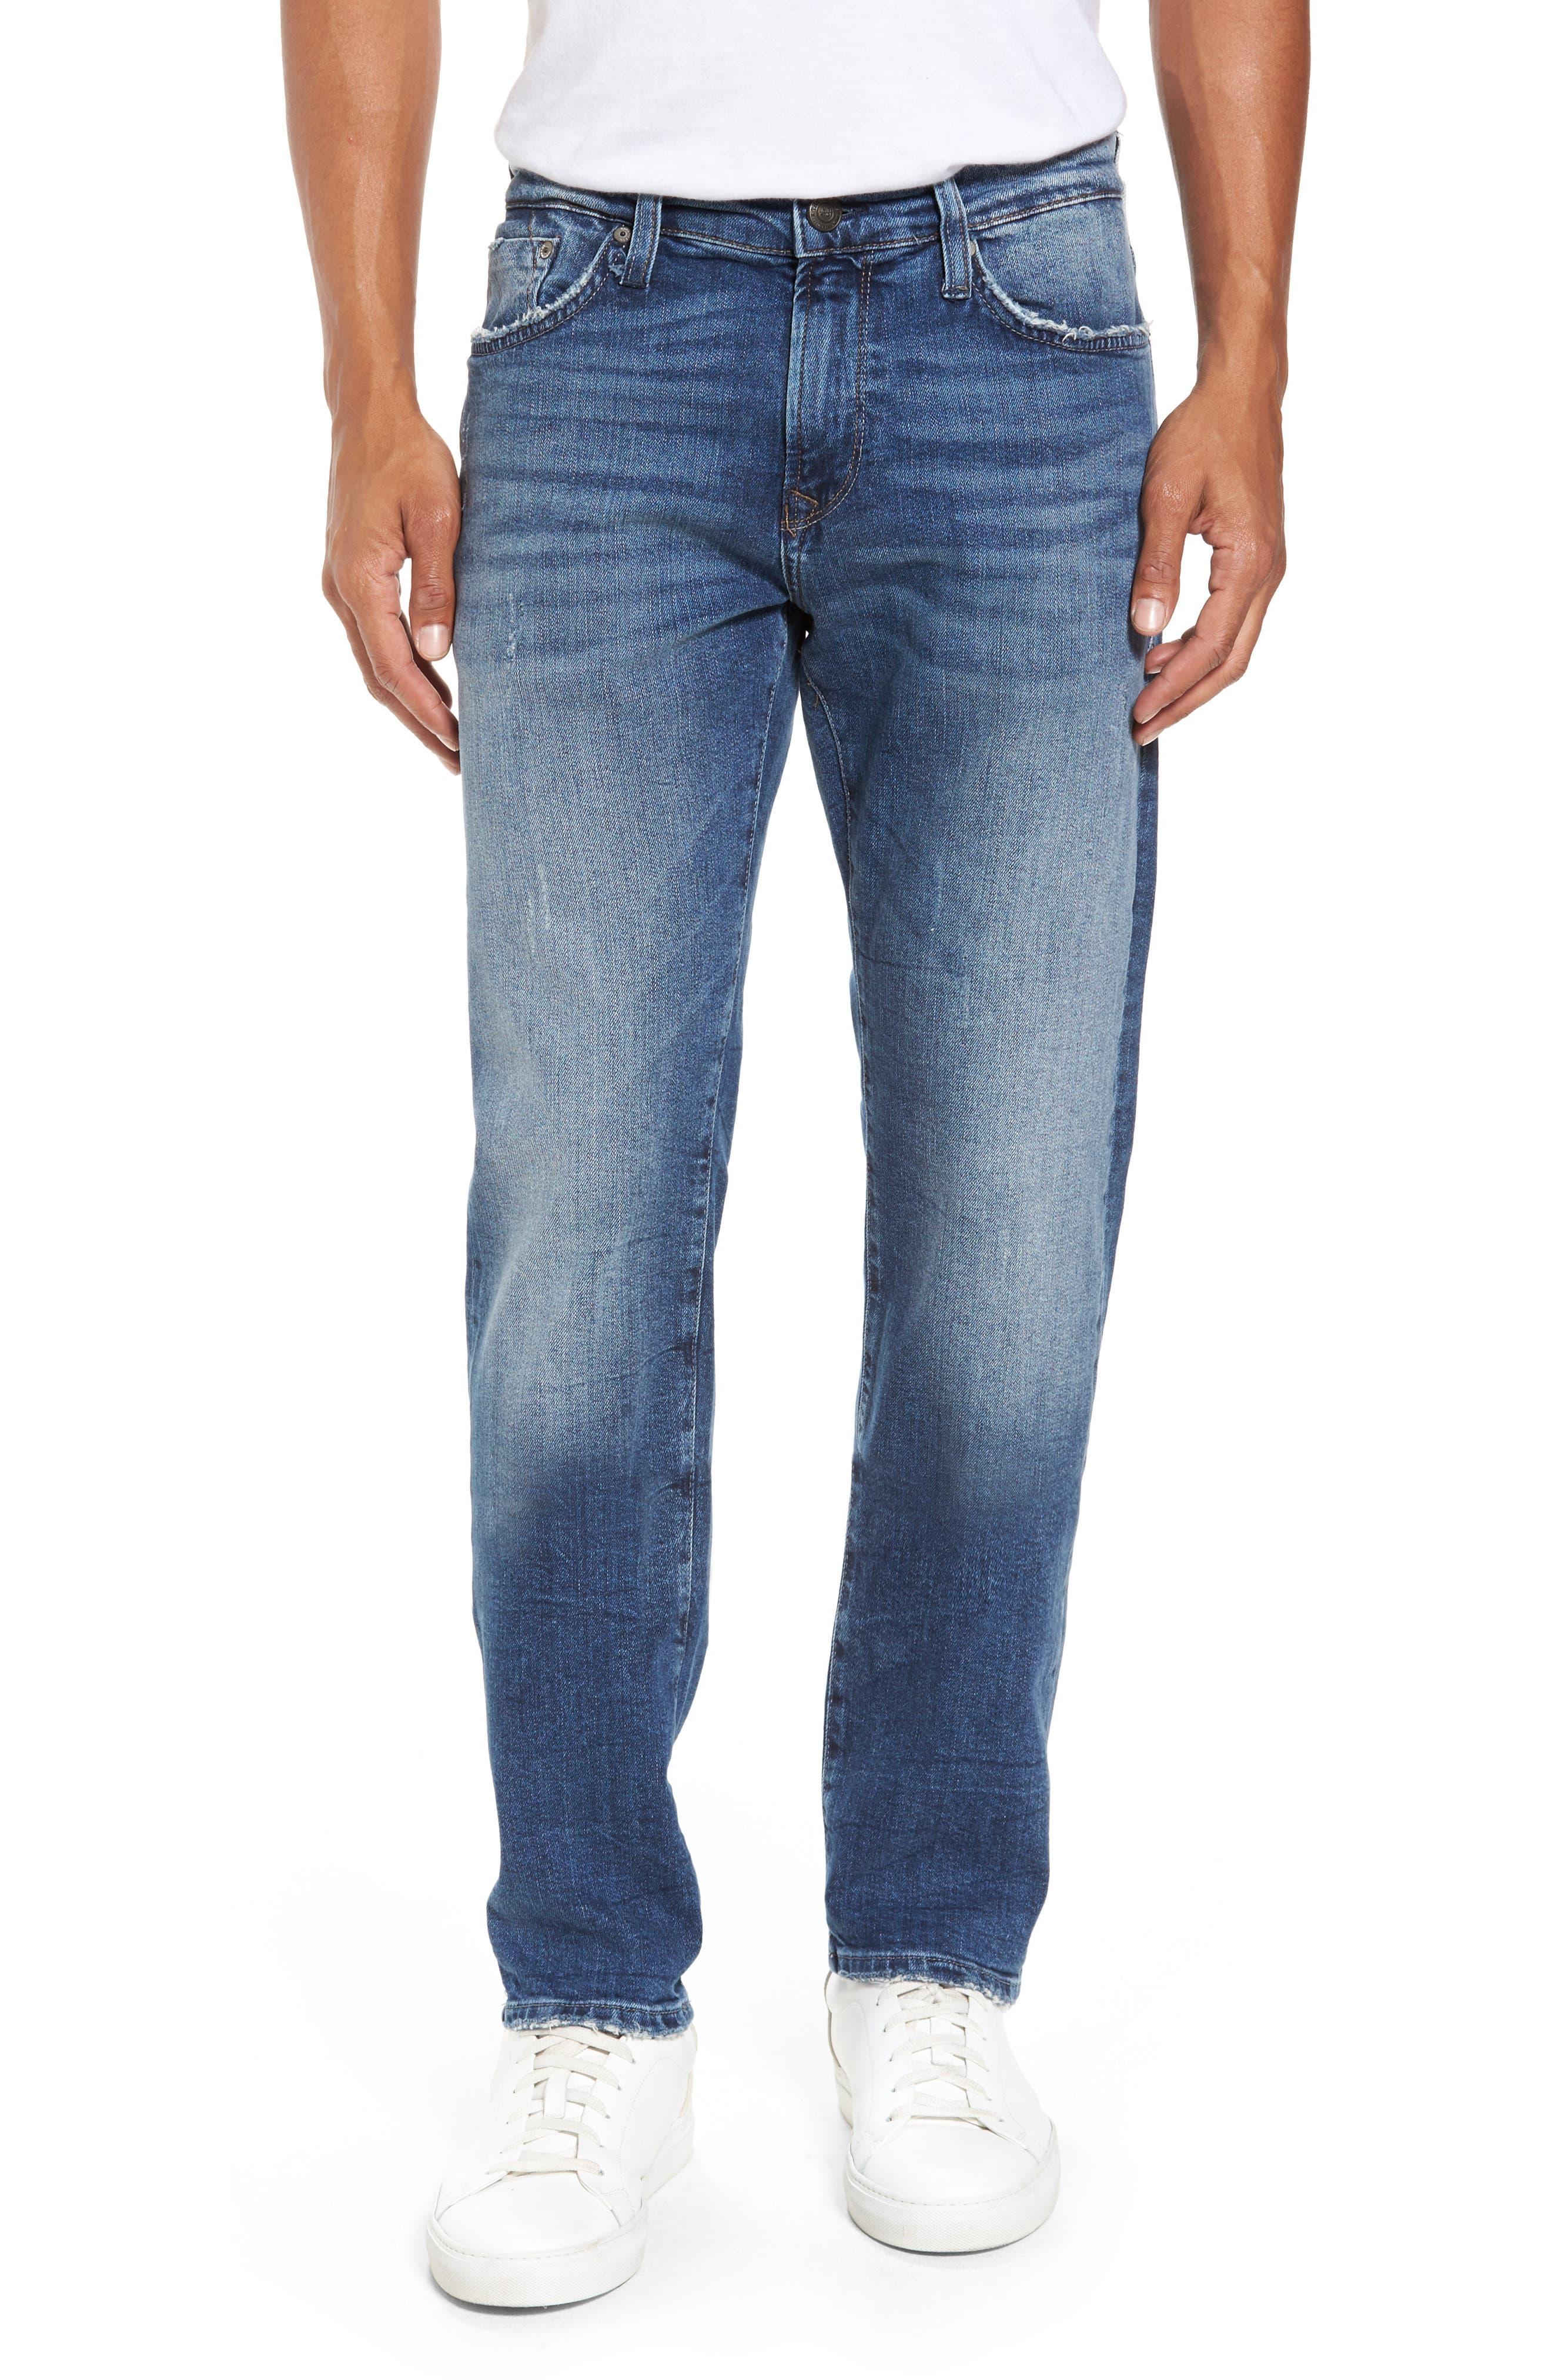 Marcus Slim Straight Leg Jeans,                         Main,                         color, Destroyed Authentic Vintage